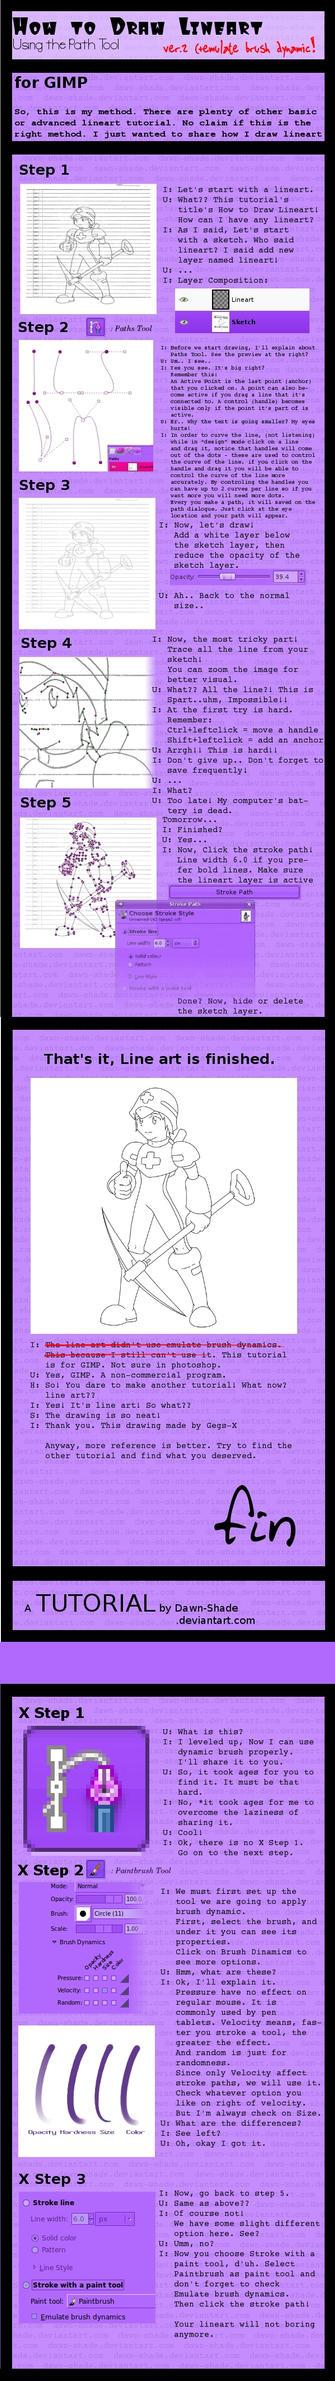 Drawing Lines Using Gimp : Line art tutorial v using gimp by dawn shade on deviantart